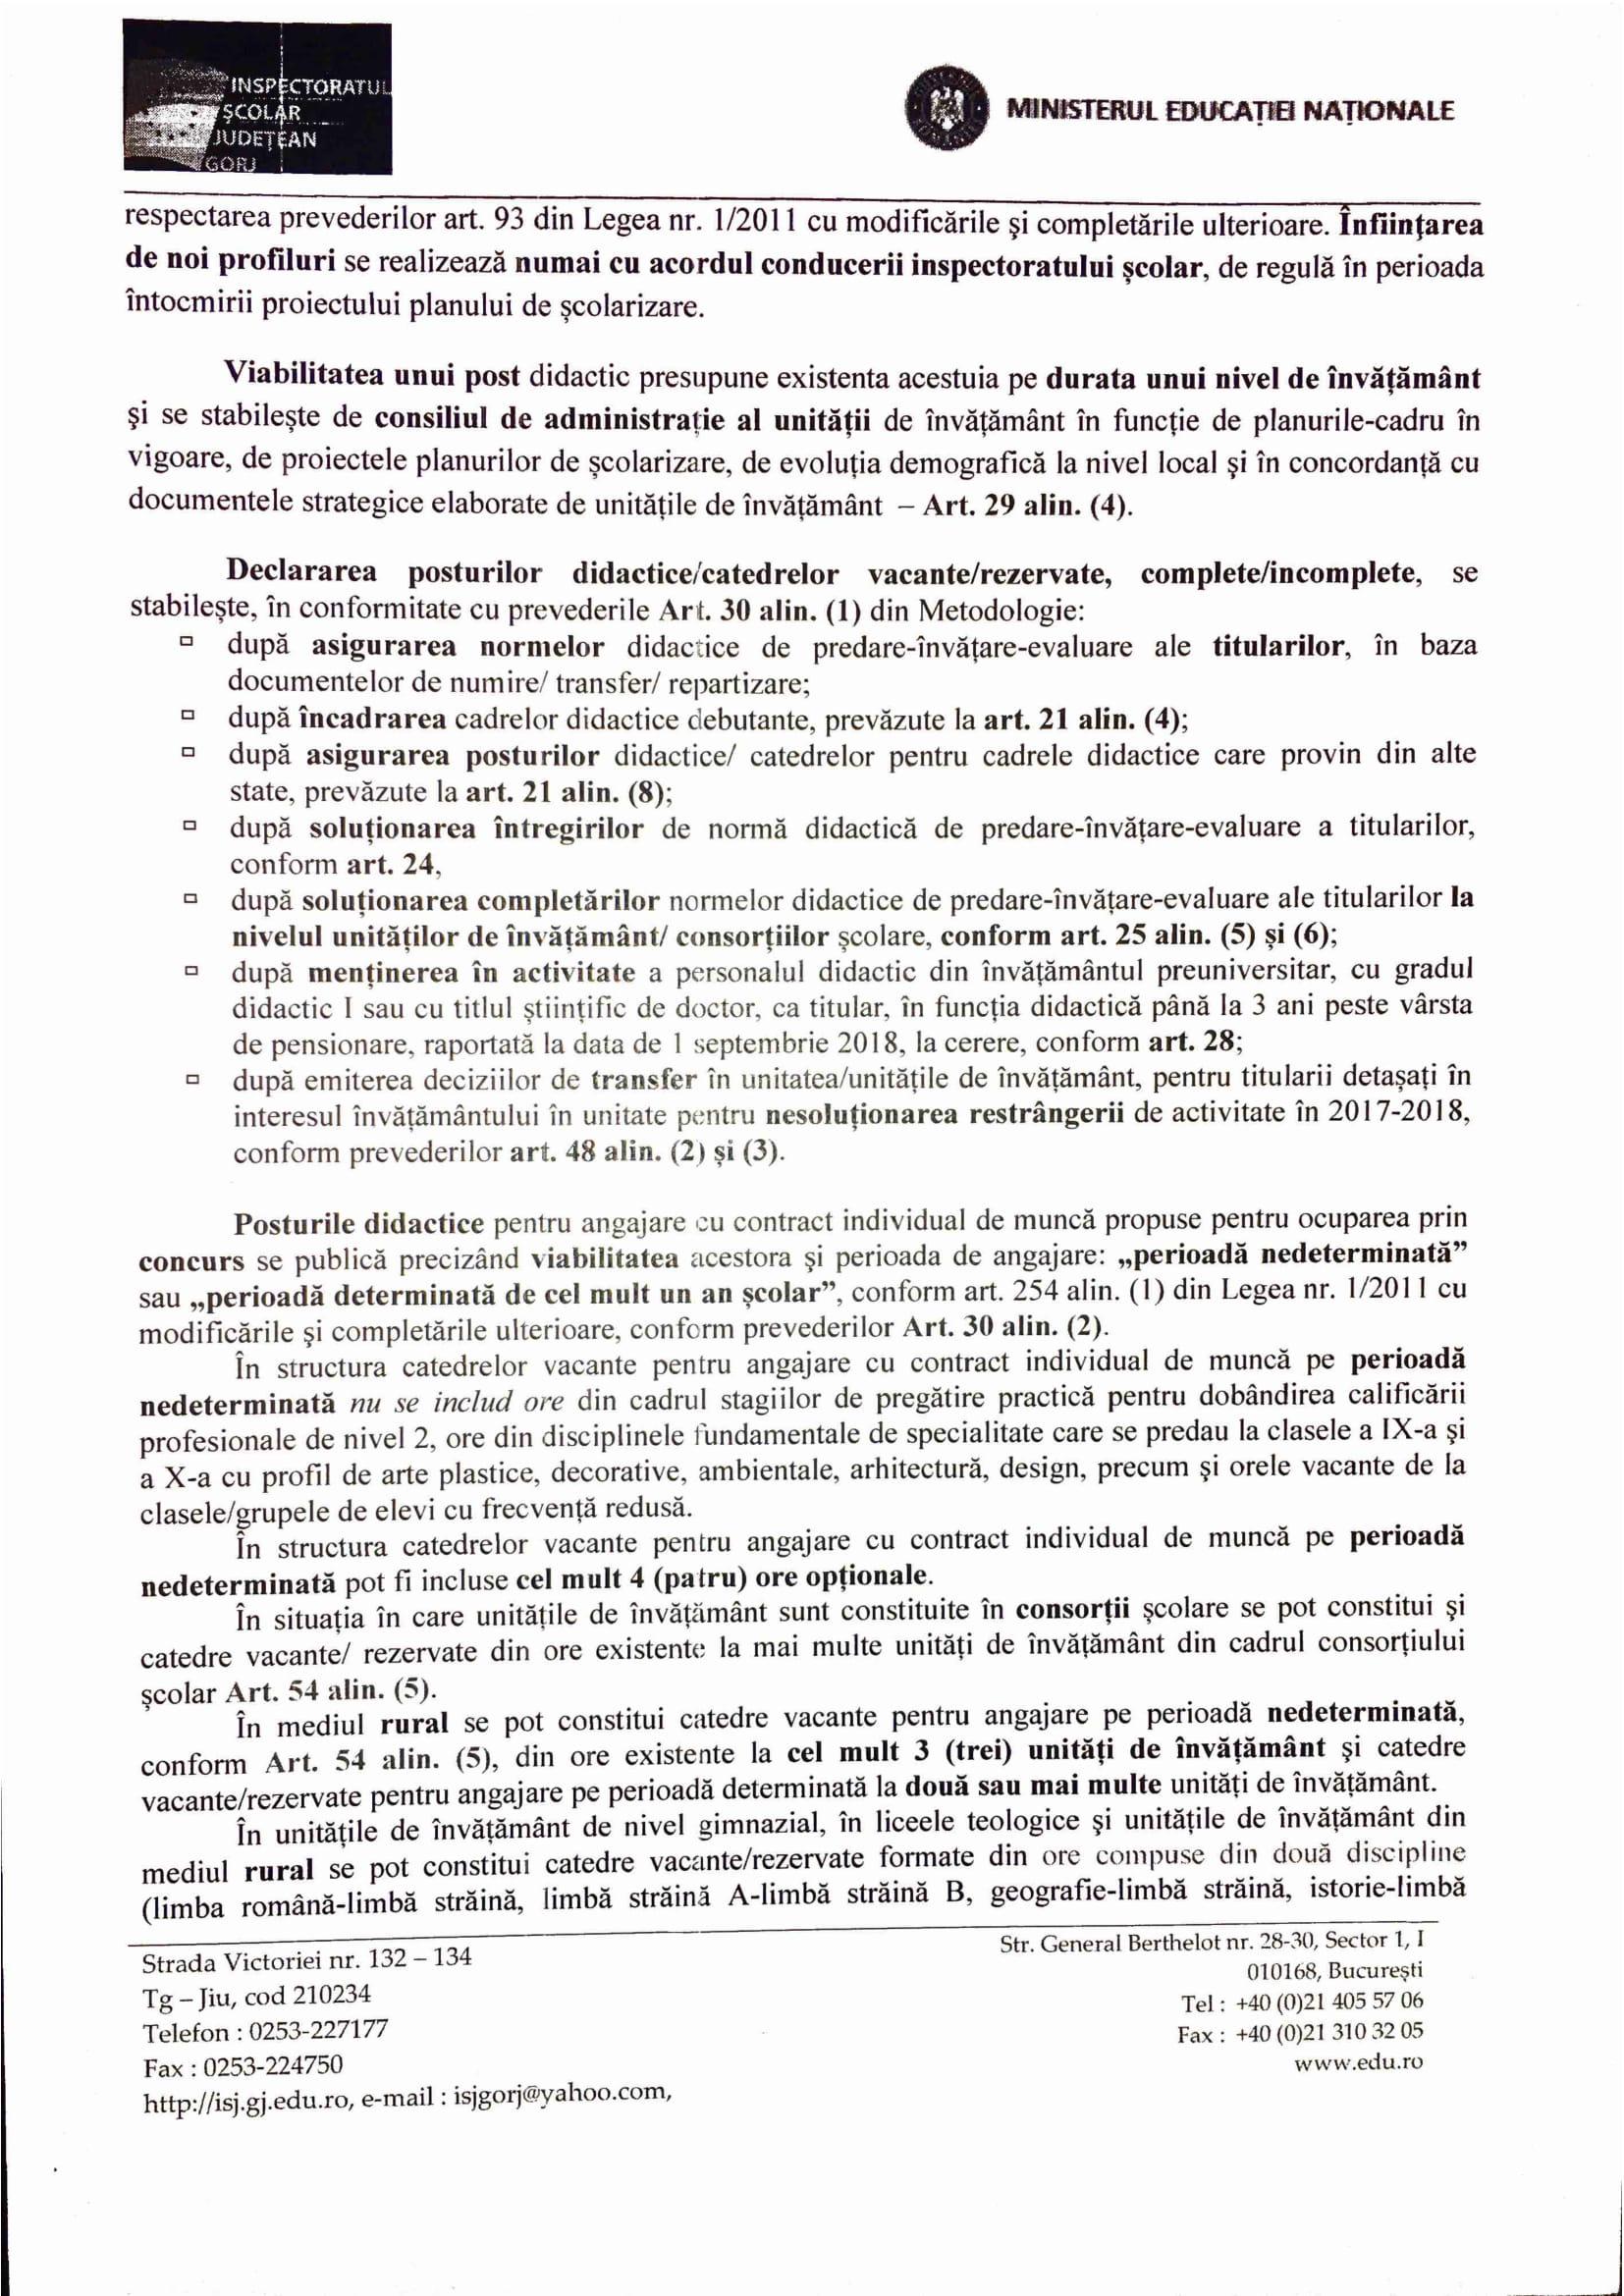 Adresa constituire_încadrare_vacantare-2